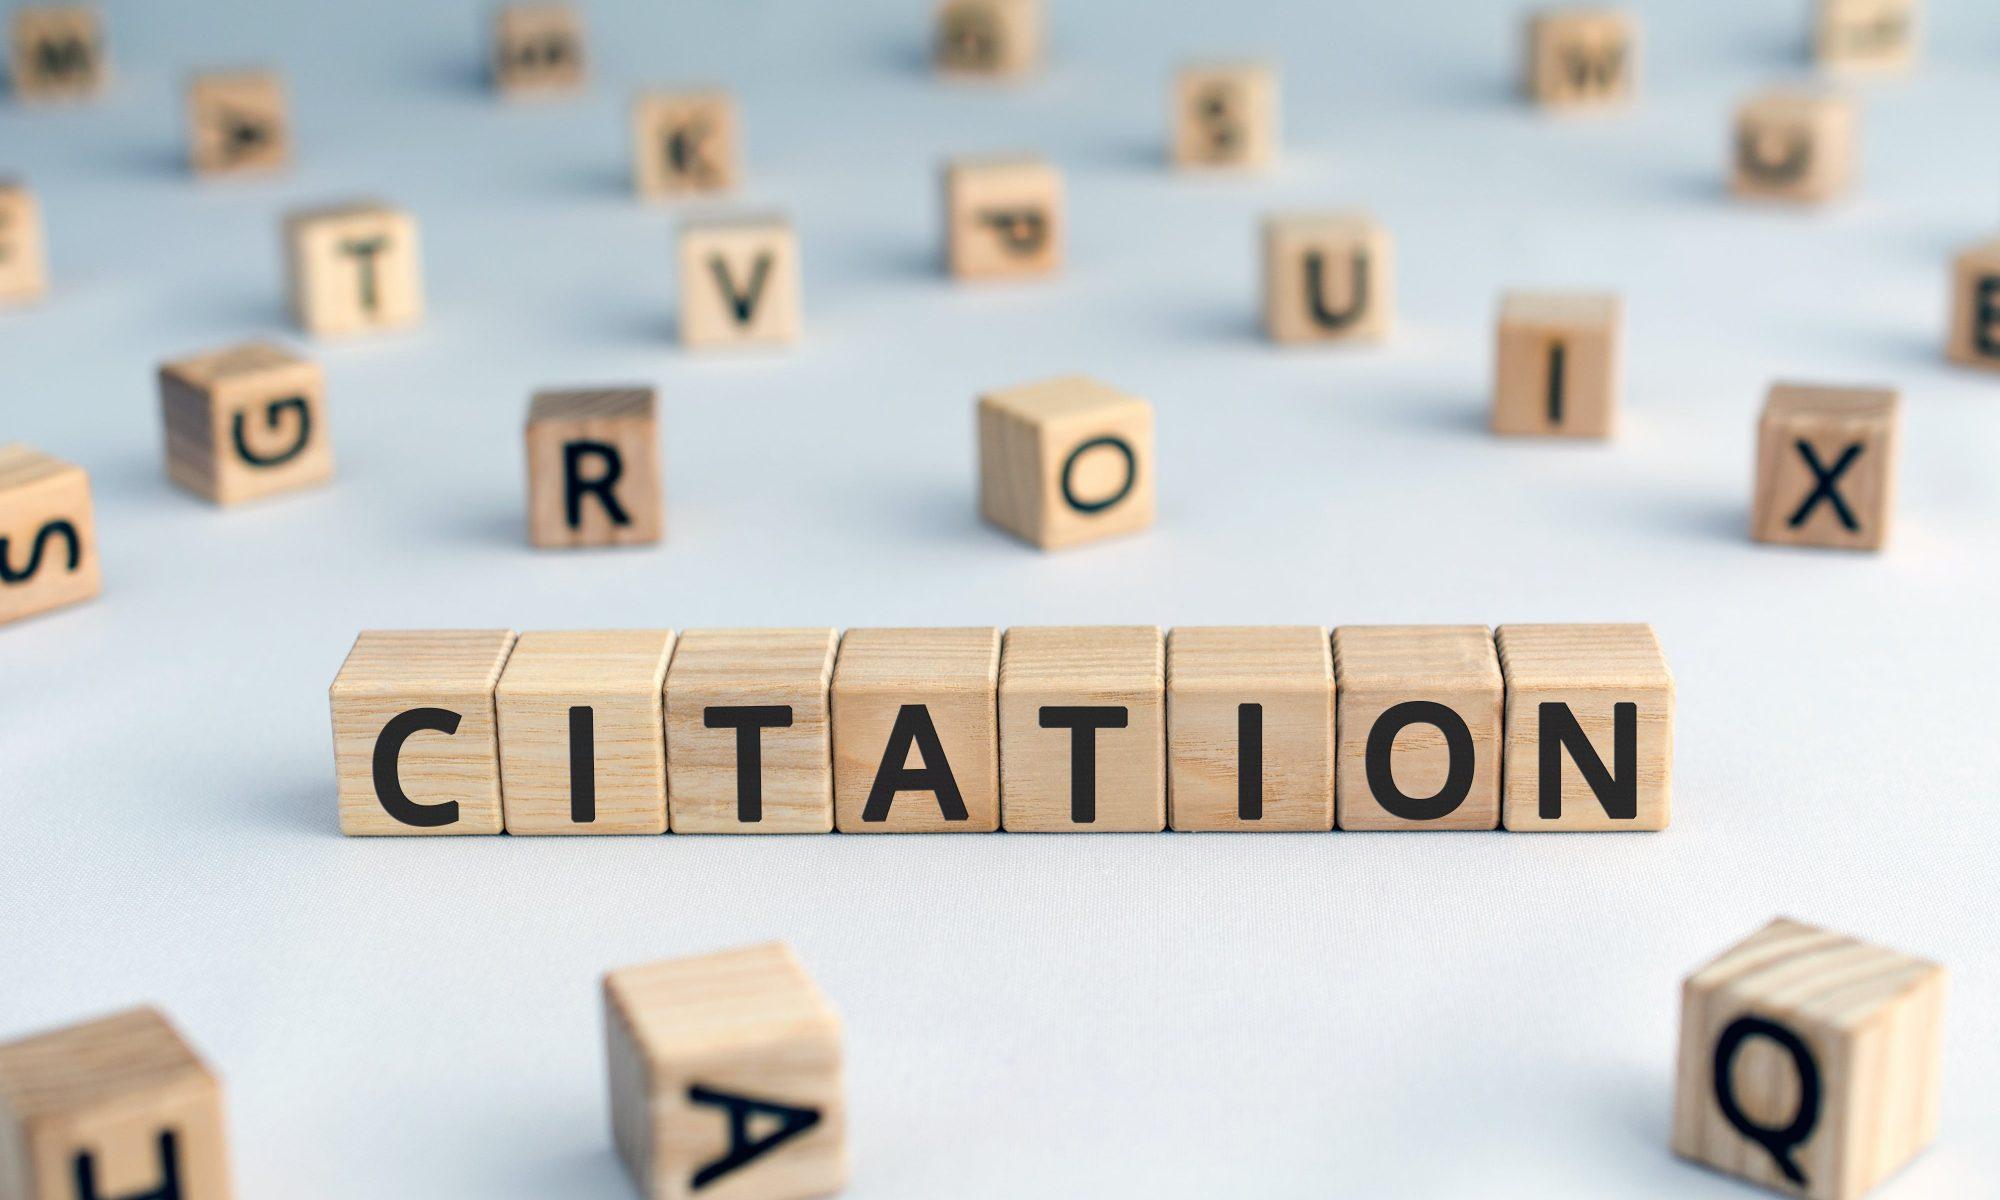 Citation Generator